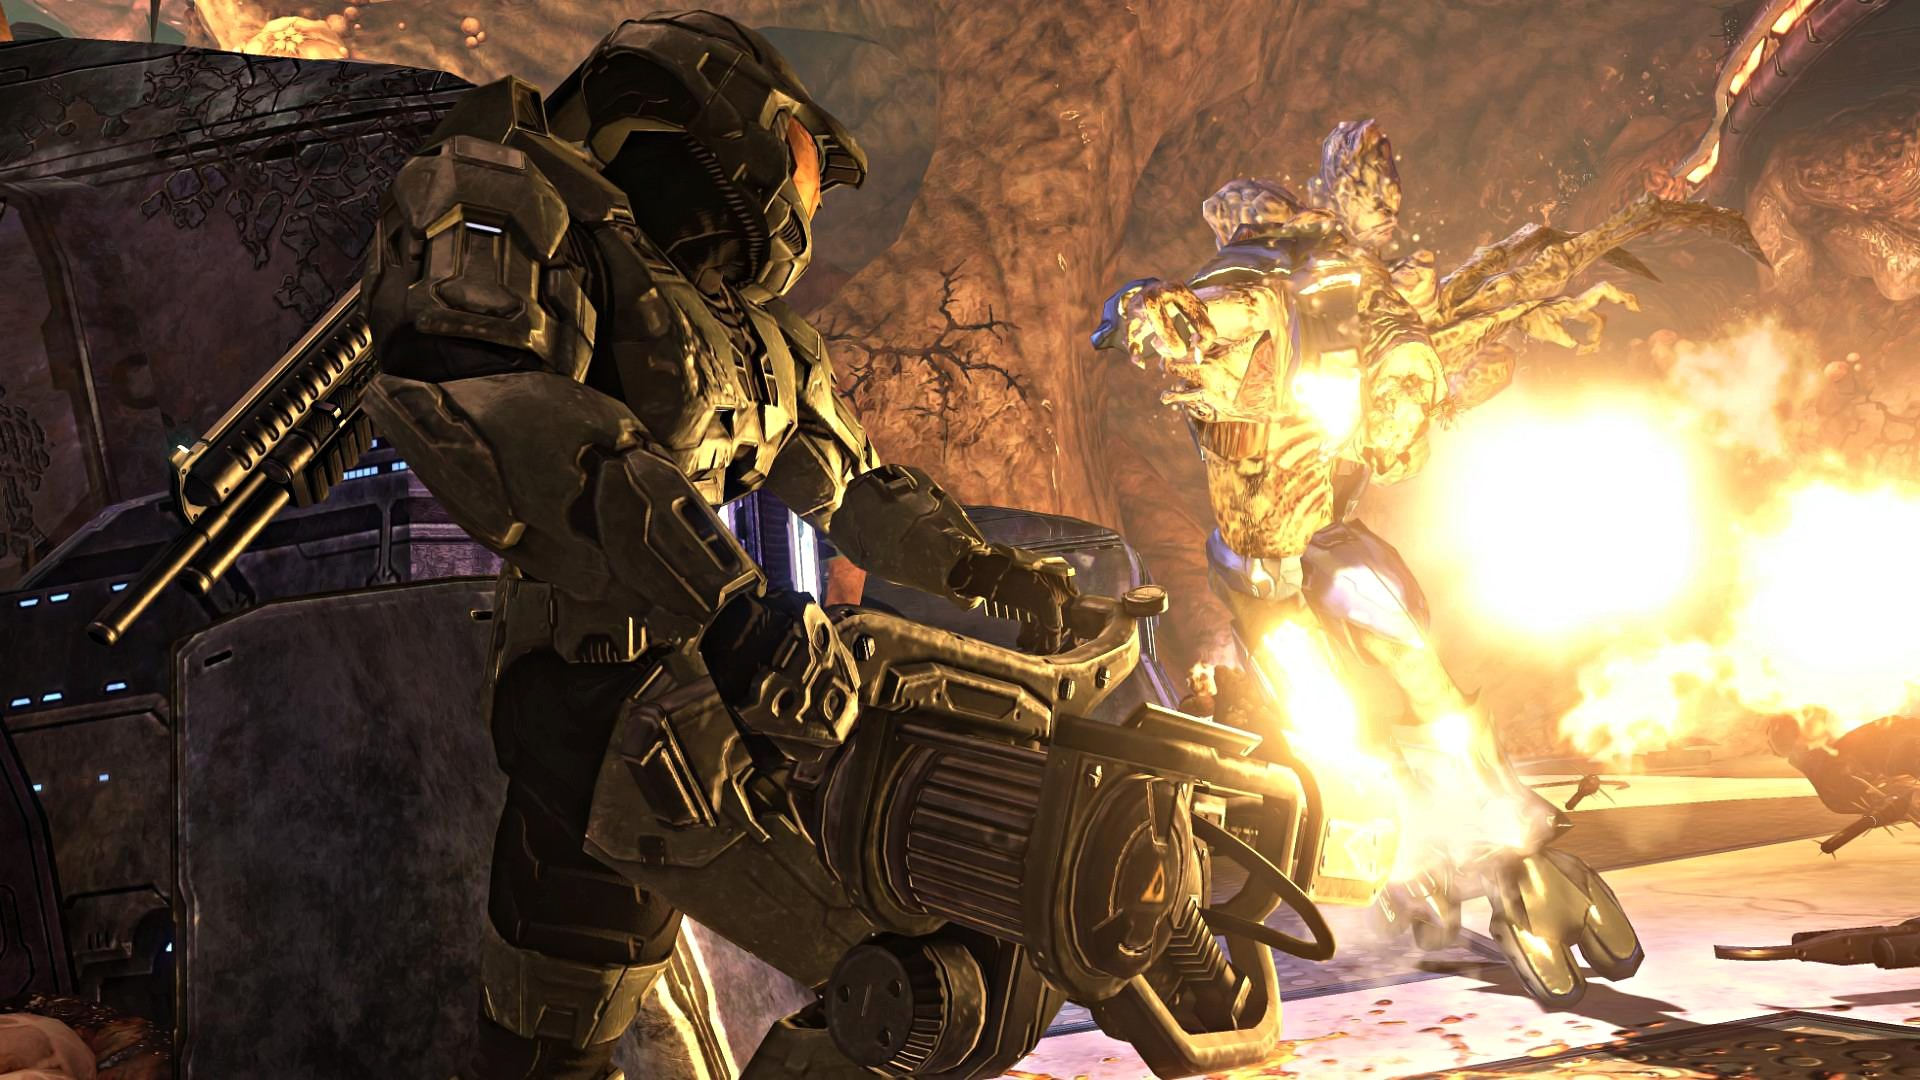 Halo 3 Wallpaper CORTANA chapter 1080p (16) MASTER CHIEF FLAMETHROWER